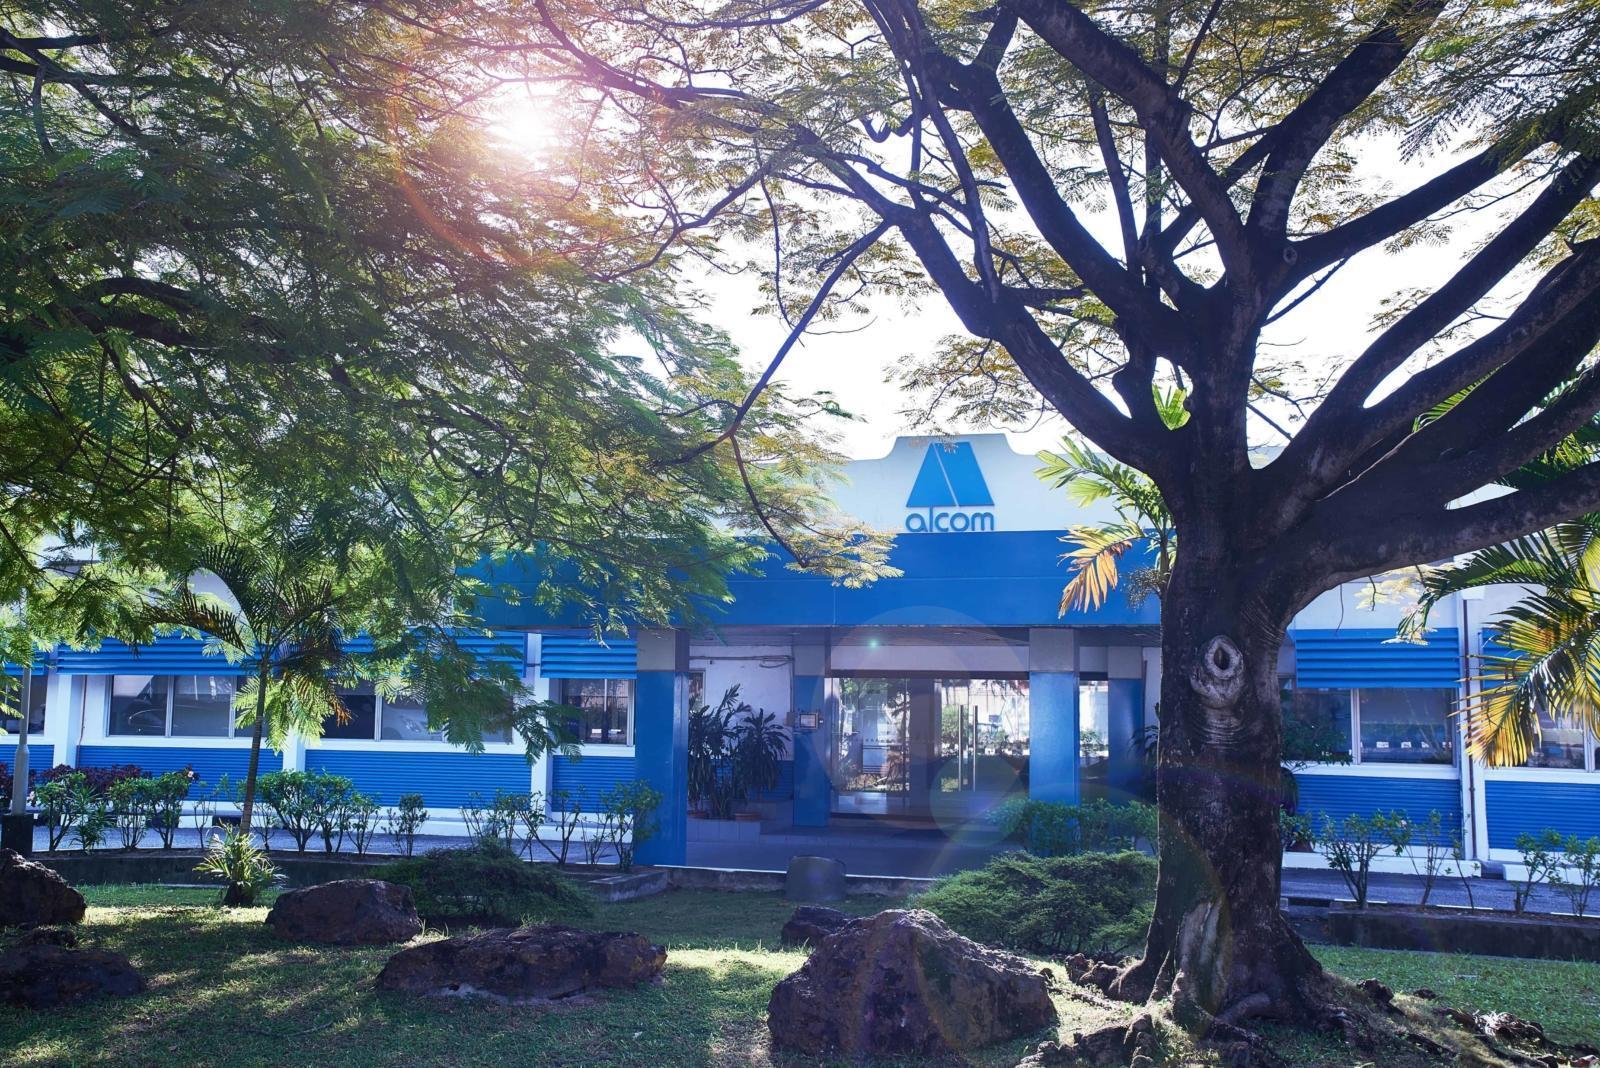 ALCOM Office | Klang, Malaysia